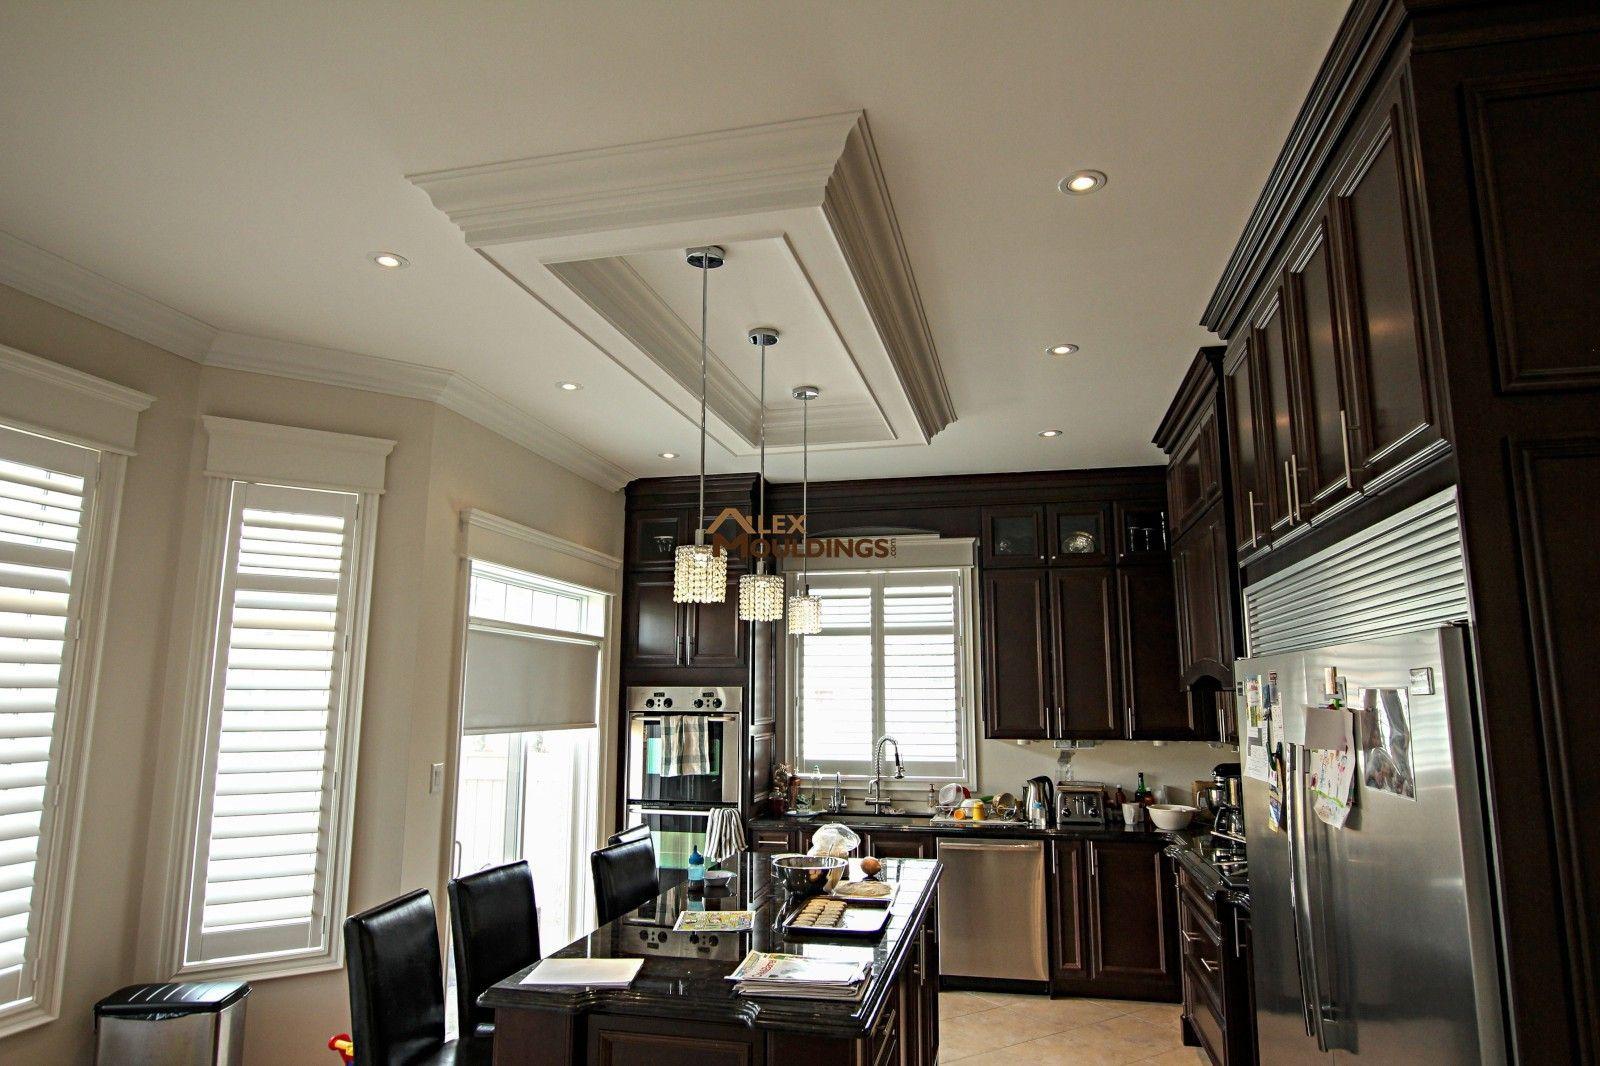 coffer lighting. Kitchen Ceiling Box With Pendant Lights Coffer Lighting